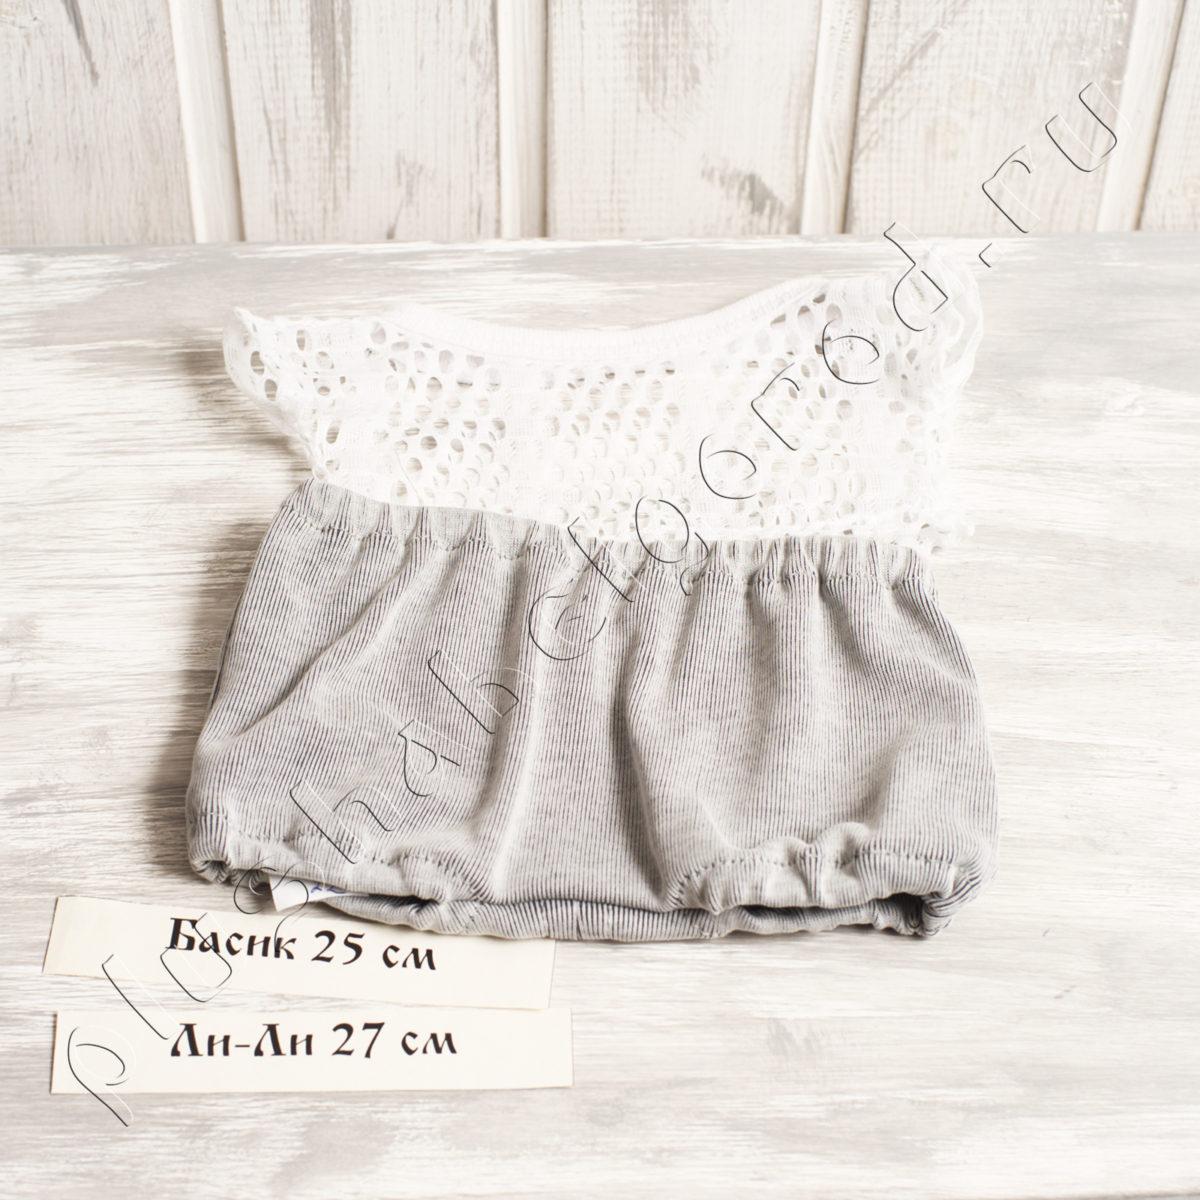 Шорты и футболка-сеточка (25,27)